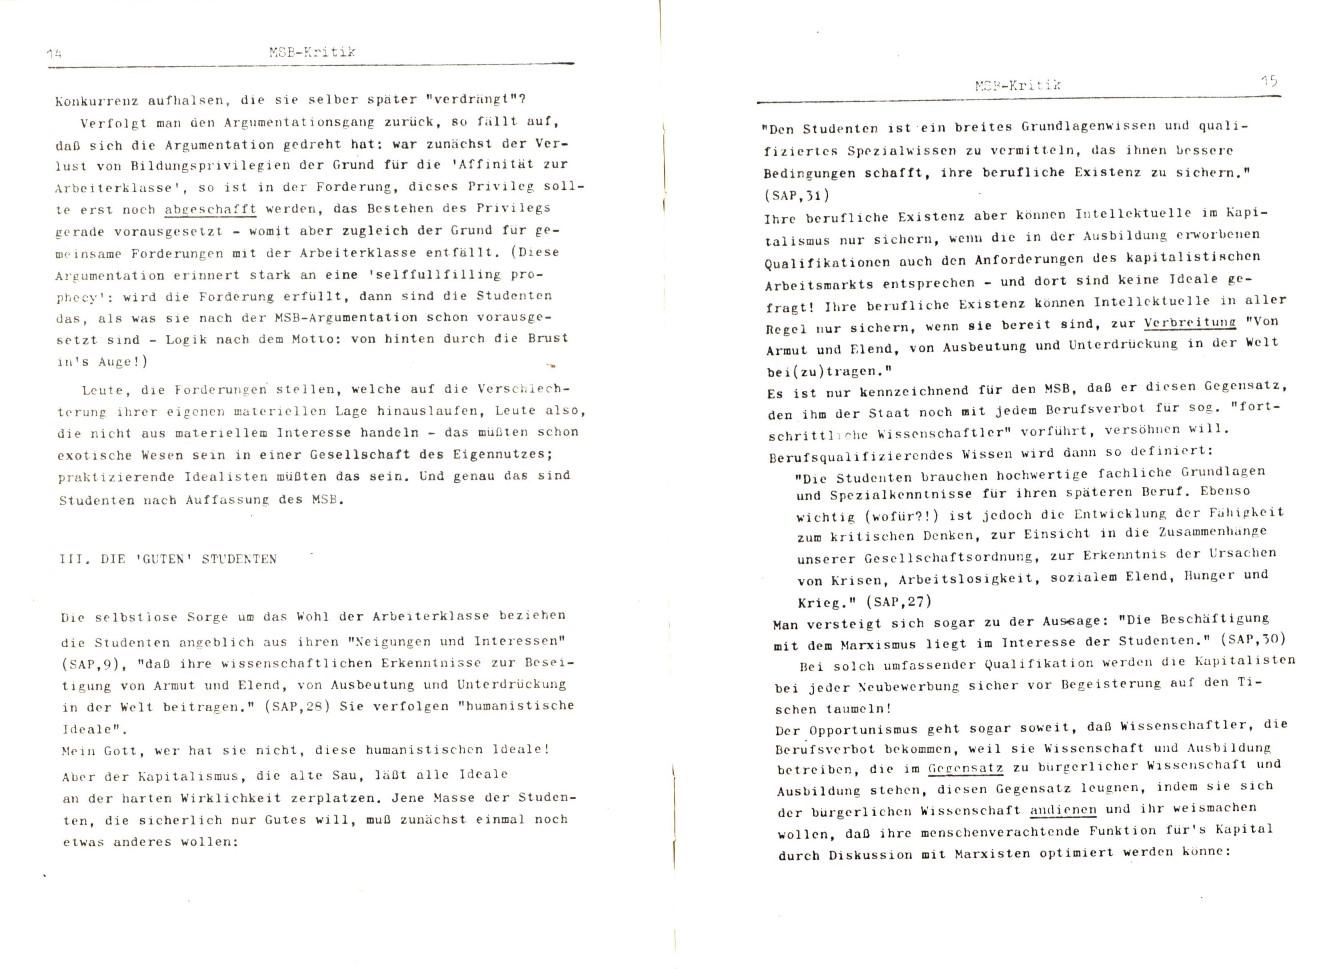 Muenster_SHO_1977_Studenteninteressen_08